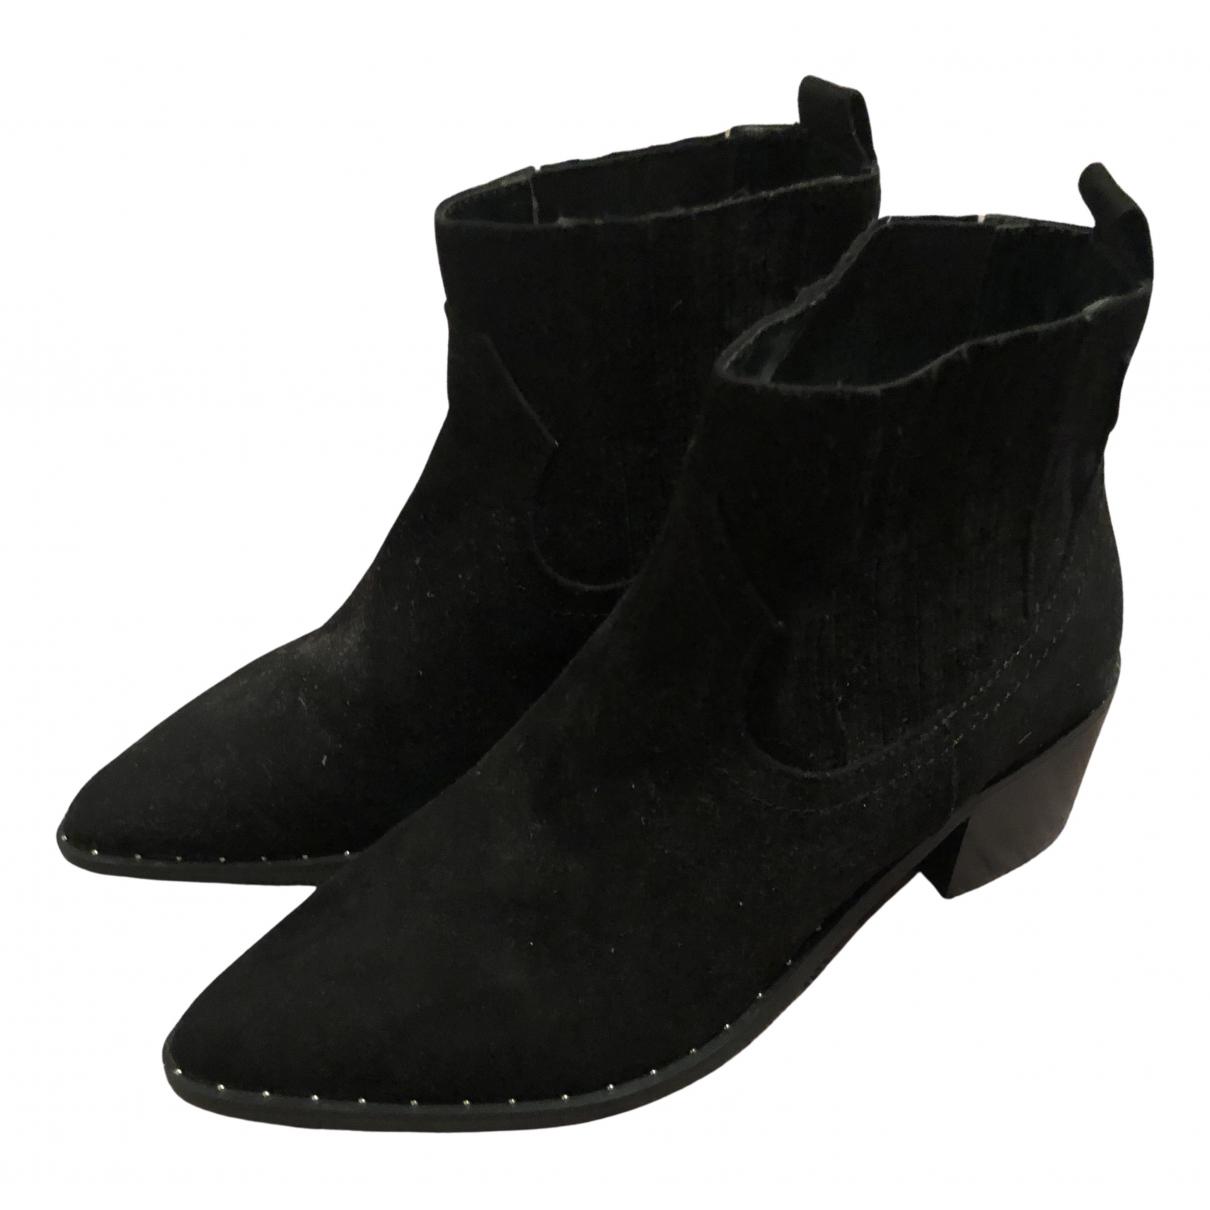 Miss Selfridge N Black Suede Boots for Women 36 EU